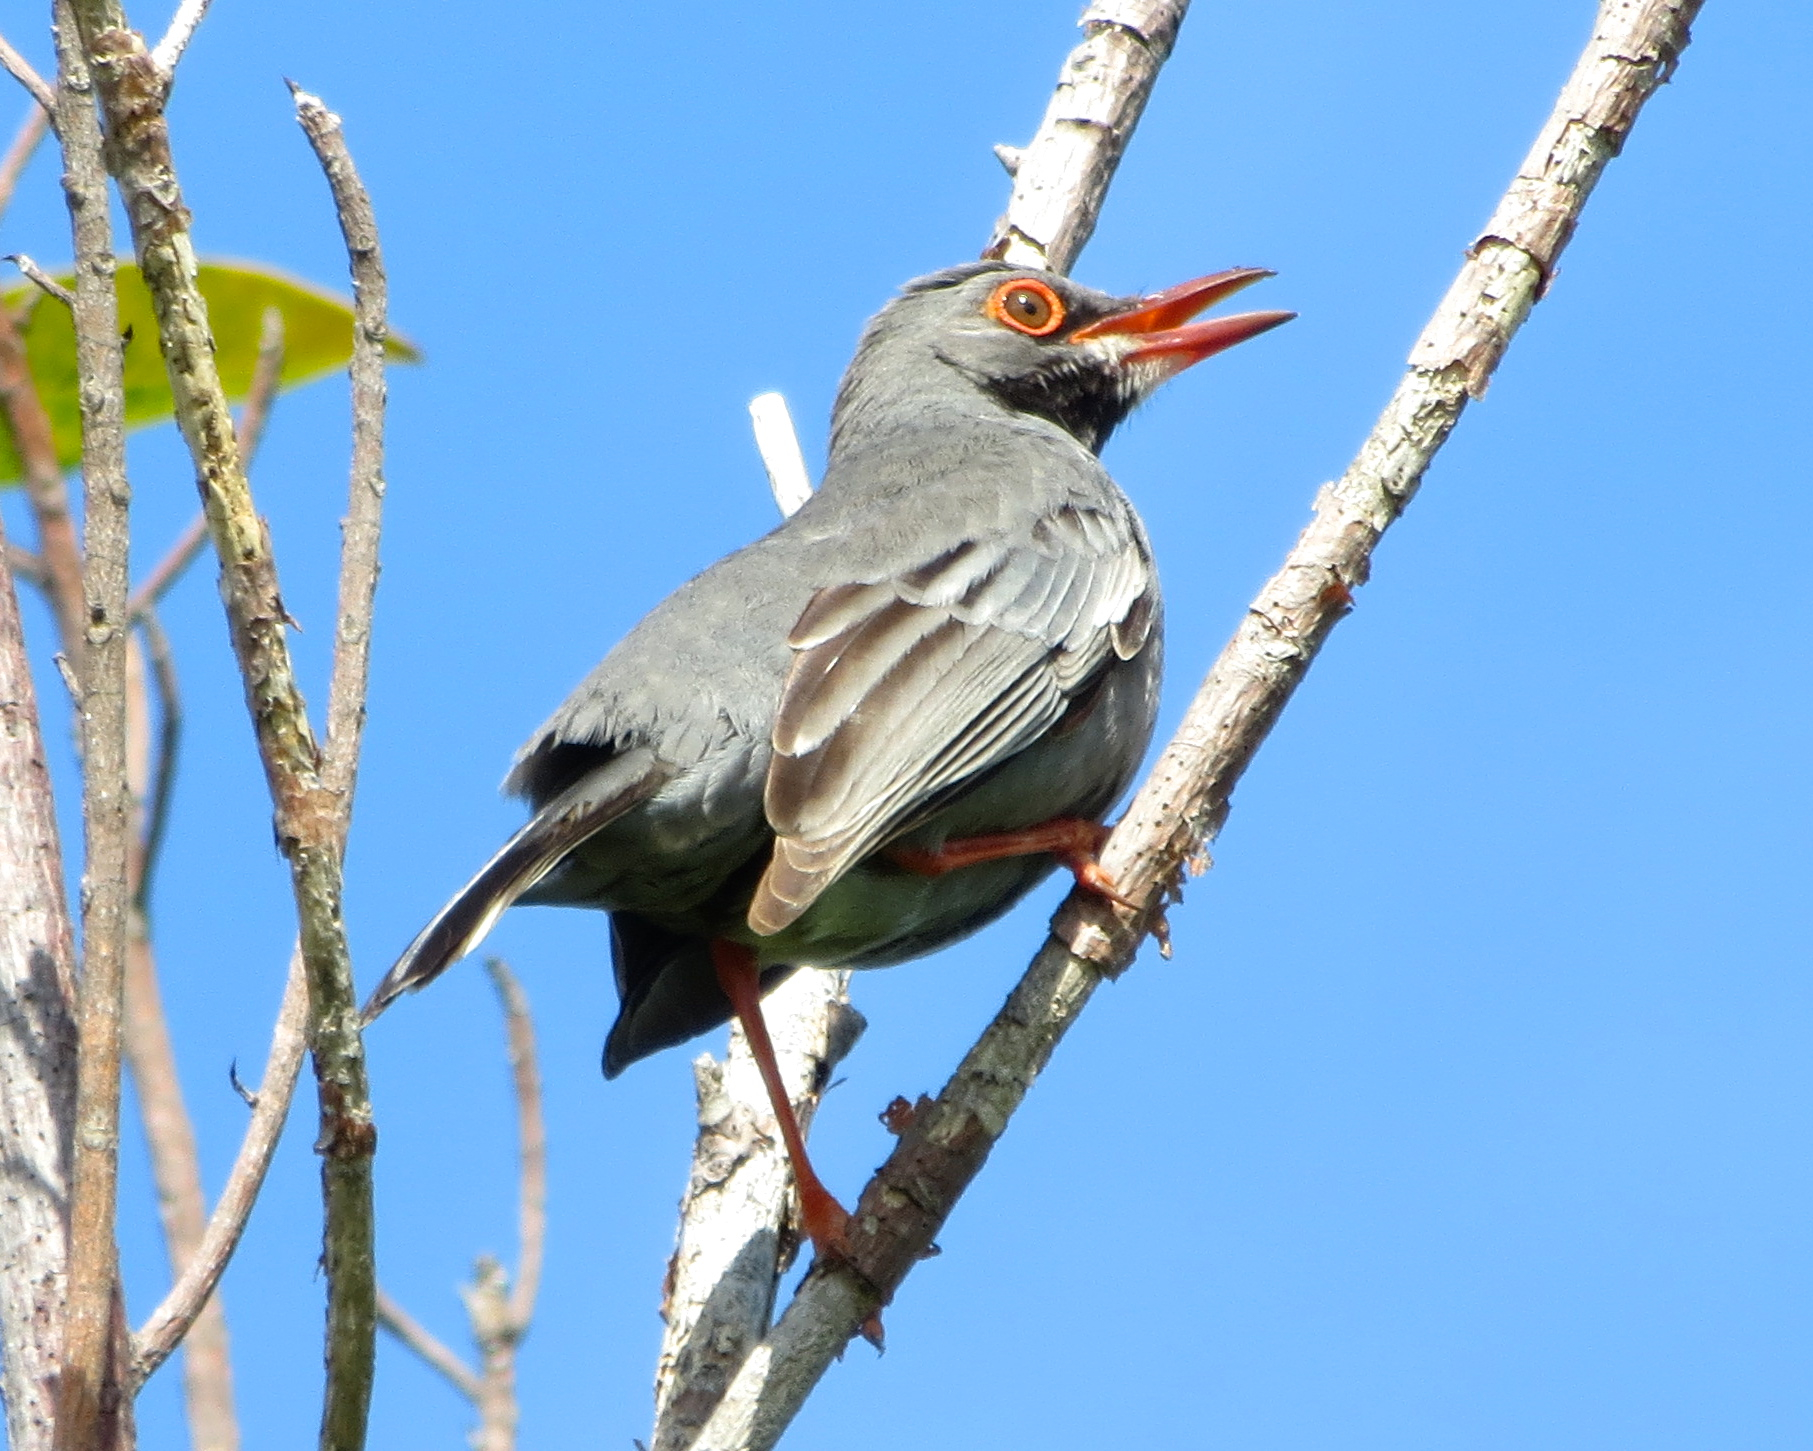 Red-legged Thrush, Abaco, Bahamas (Keith Salvesen)